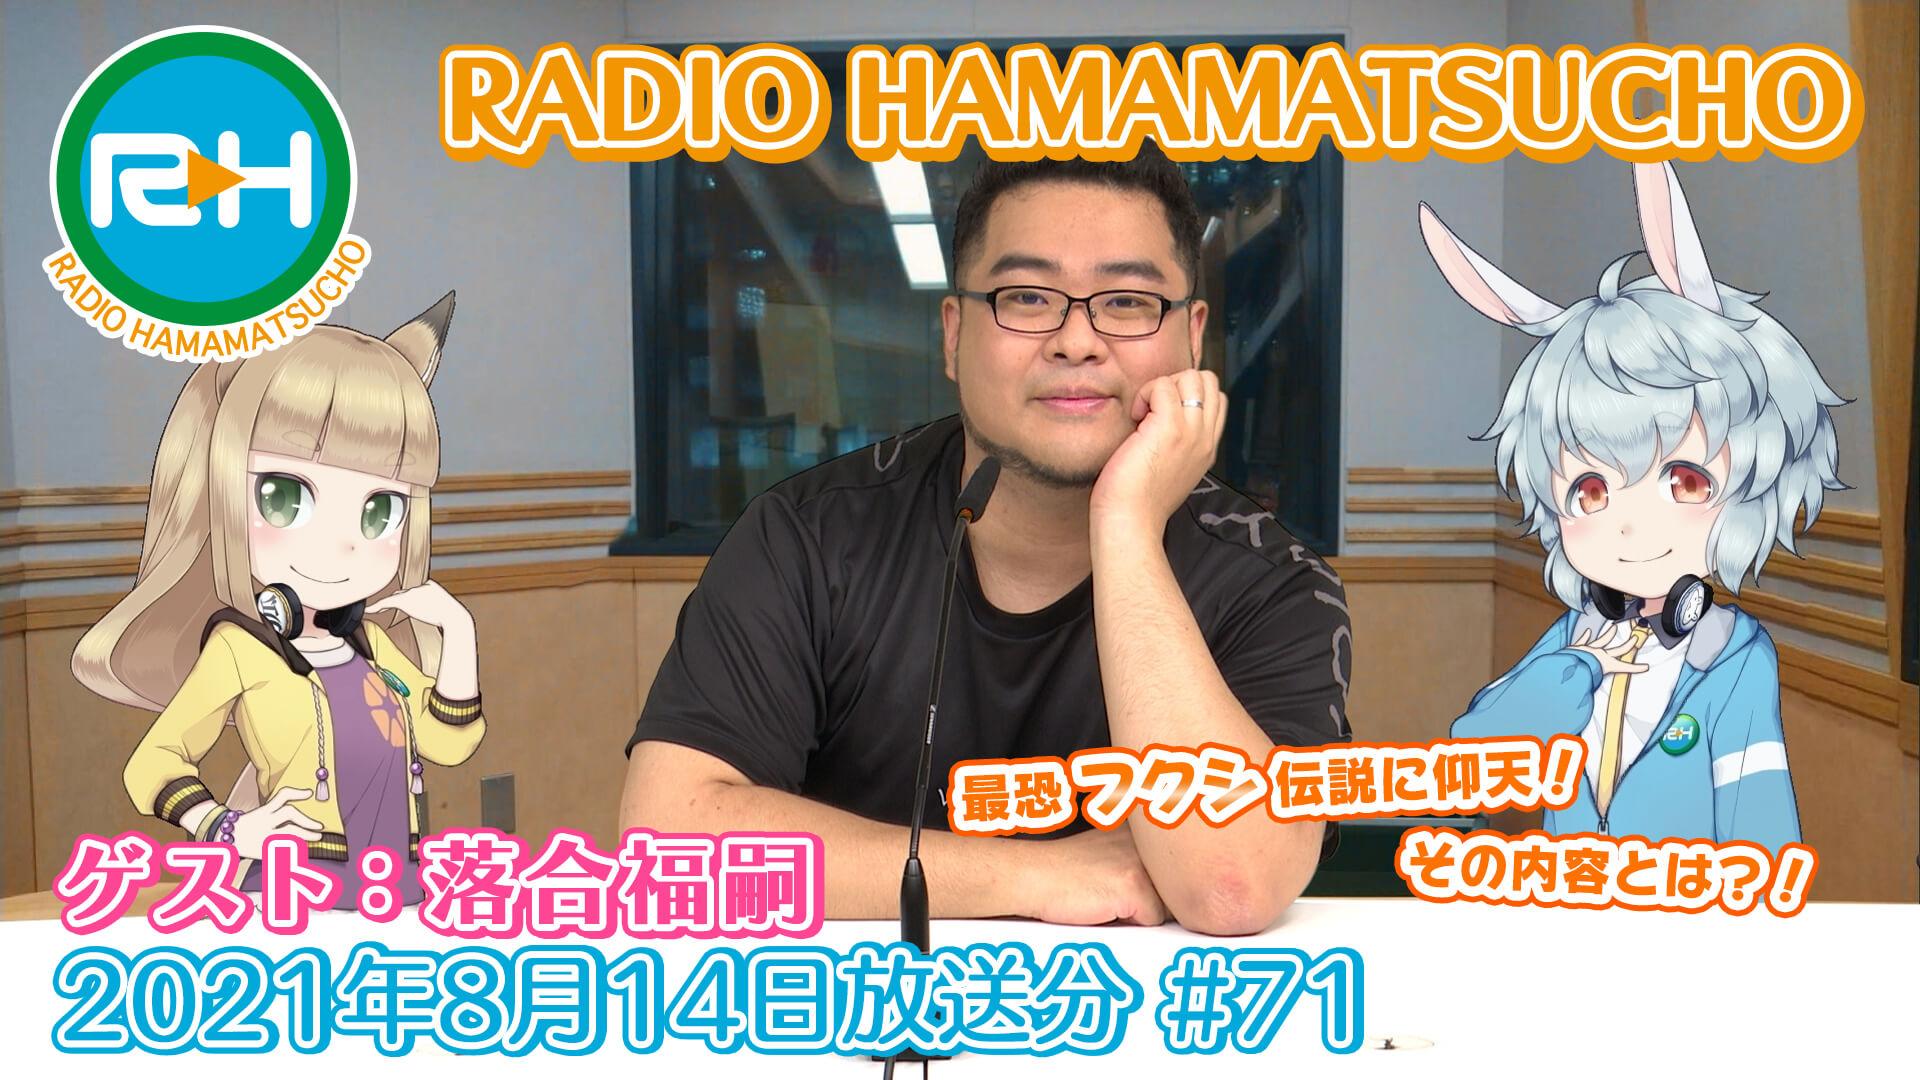 RADIO HAMAMATSUCHO 第71回 (2021年8月14日放送分) ゲスト:  落合福嗣